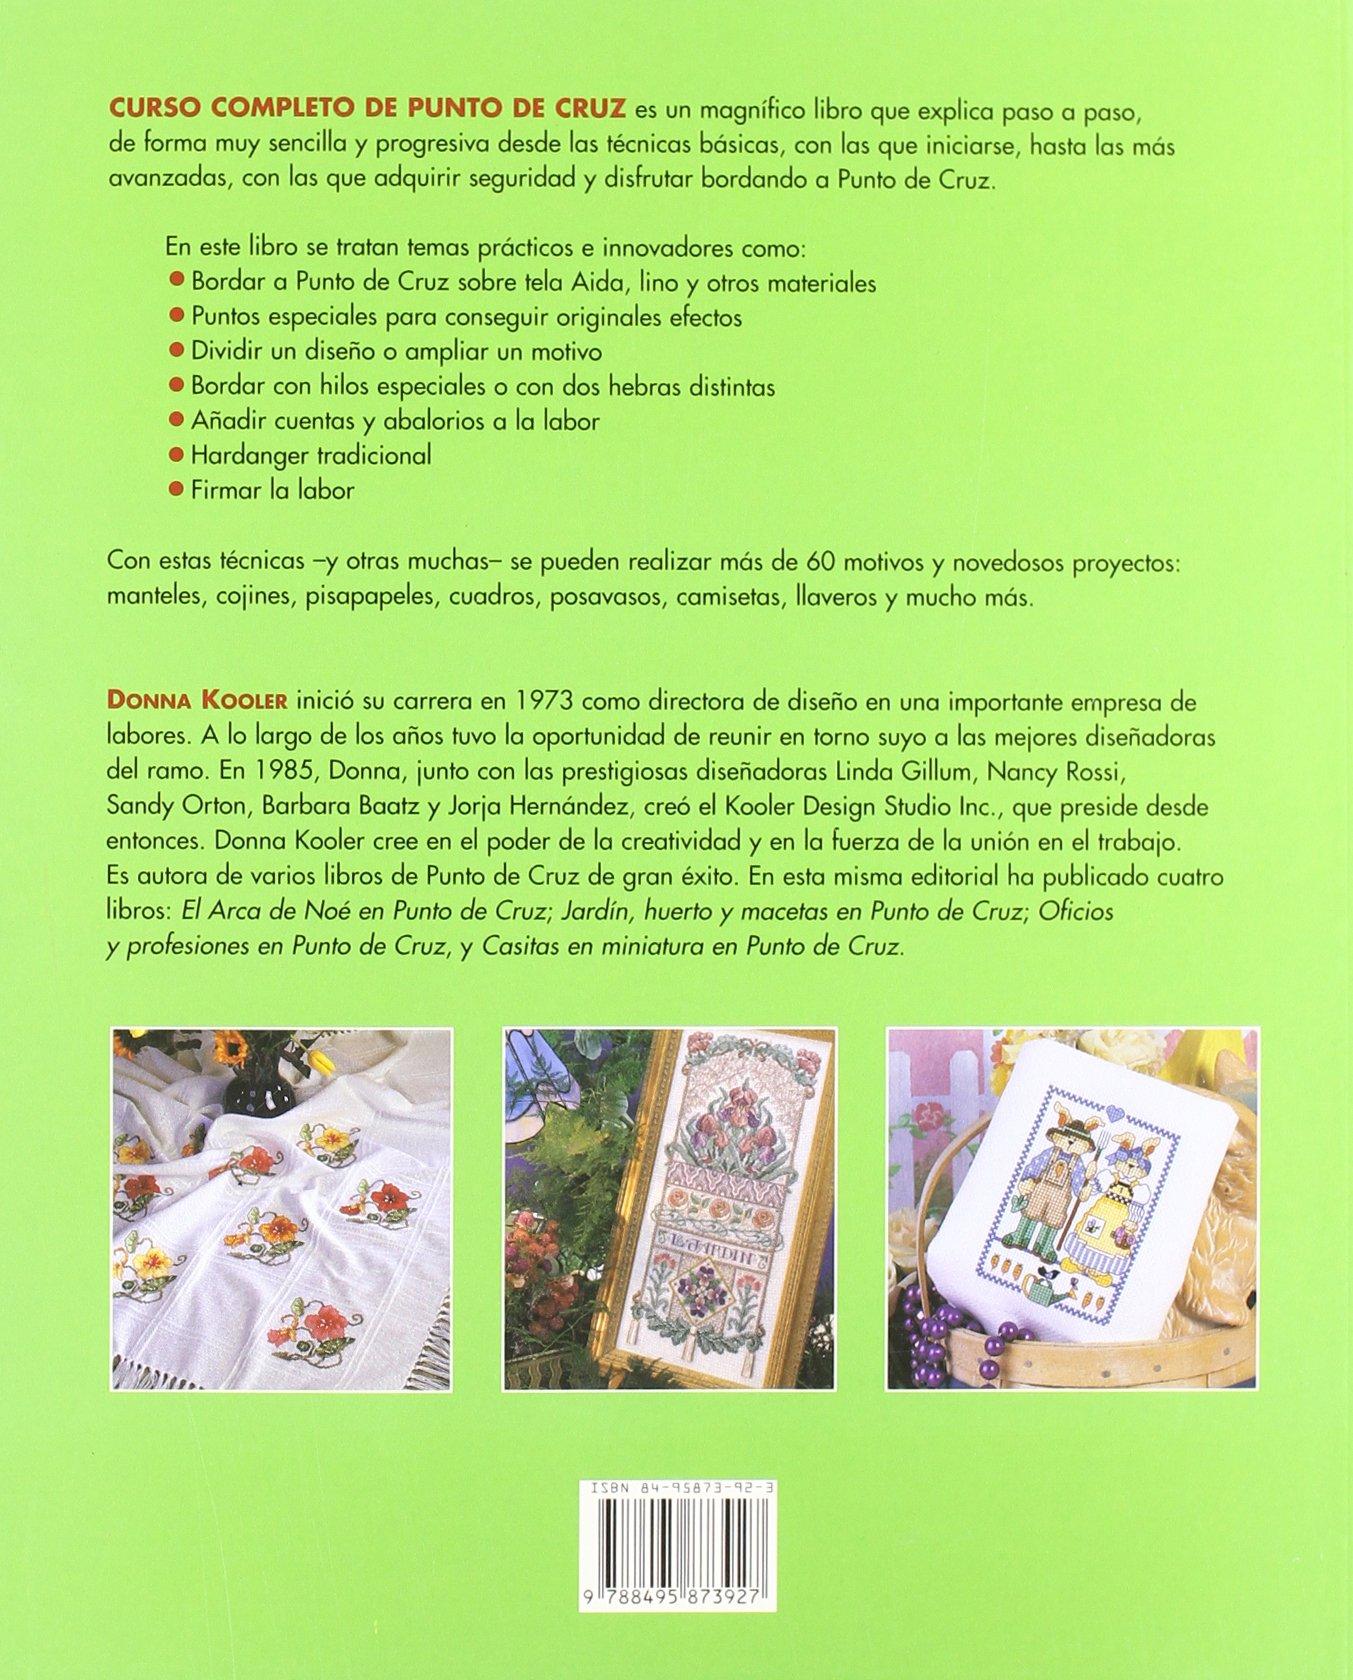 Curso Completo De Punto De Cruz (Spanish Edition): Donna Kooler: 9788495873927: Amazon.com: Books